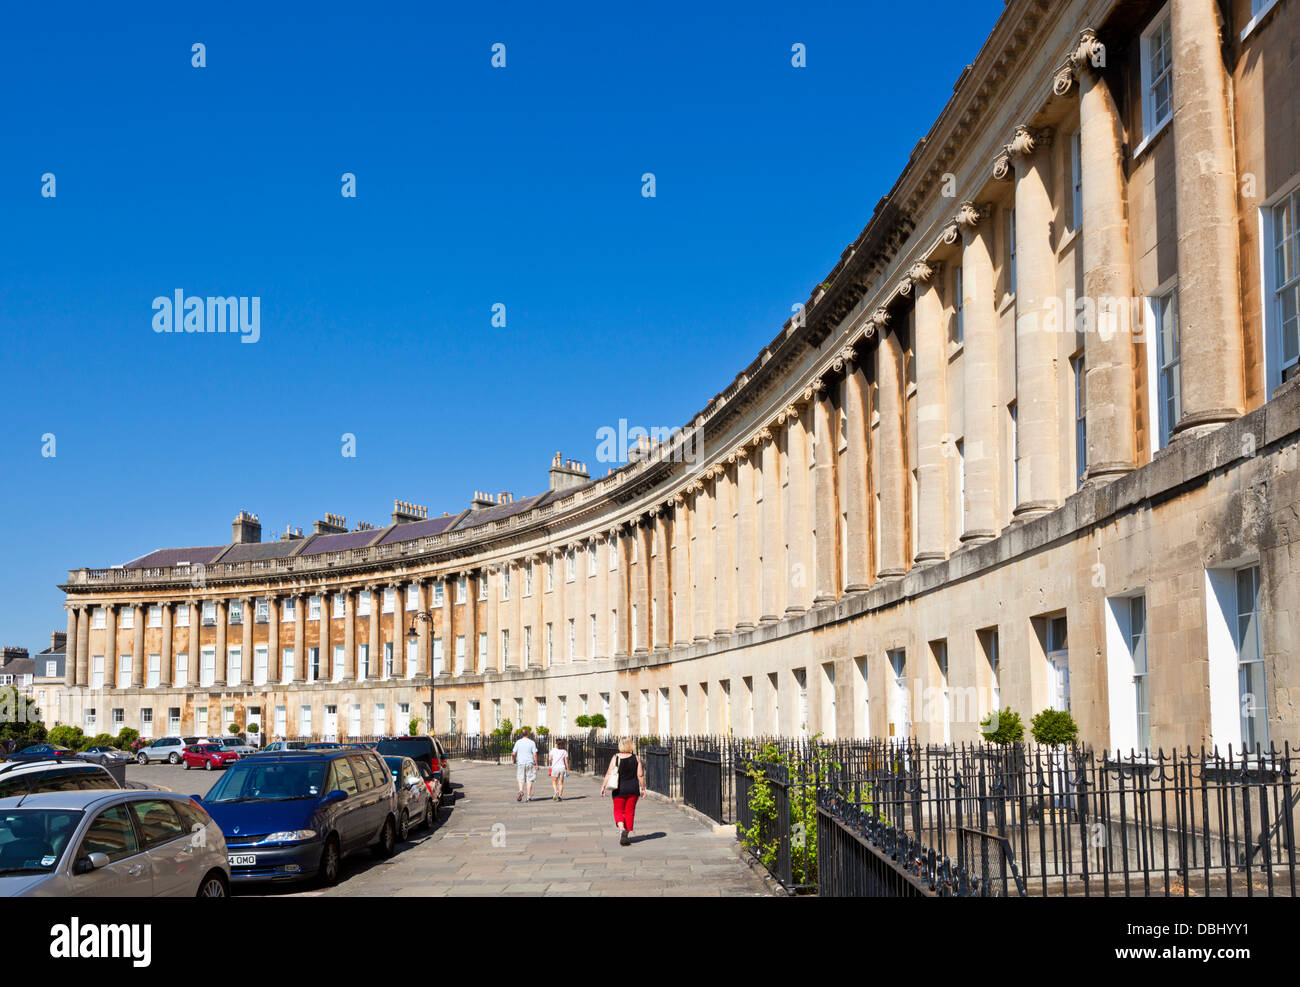 El Royal Crescent hilera de casas georgianas con barandas ornamentadas Bath Somerset Noreste de Inglaterra Imagen De Stock